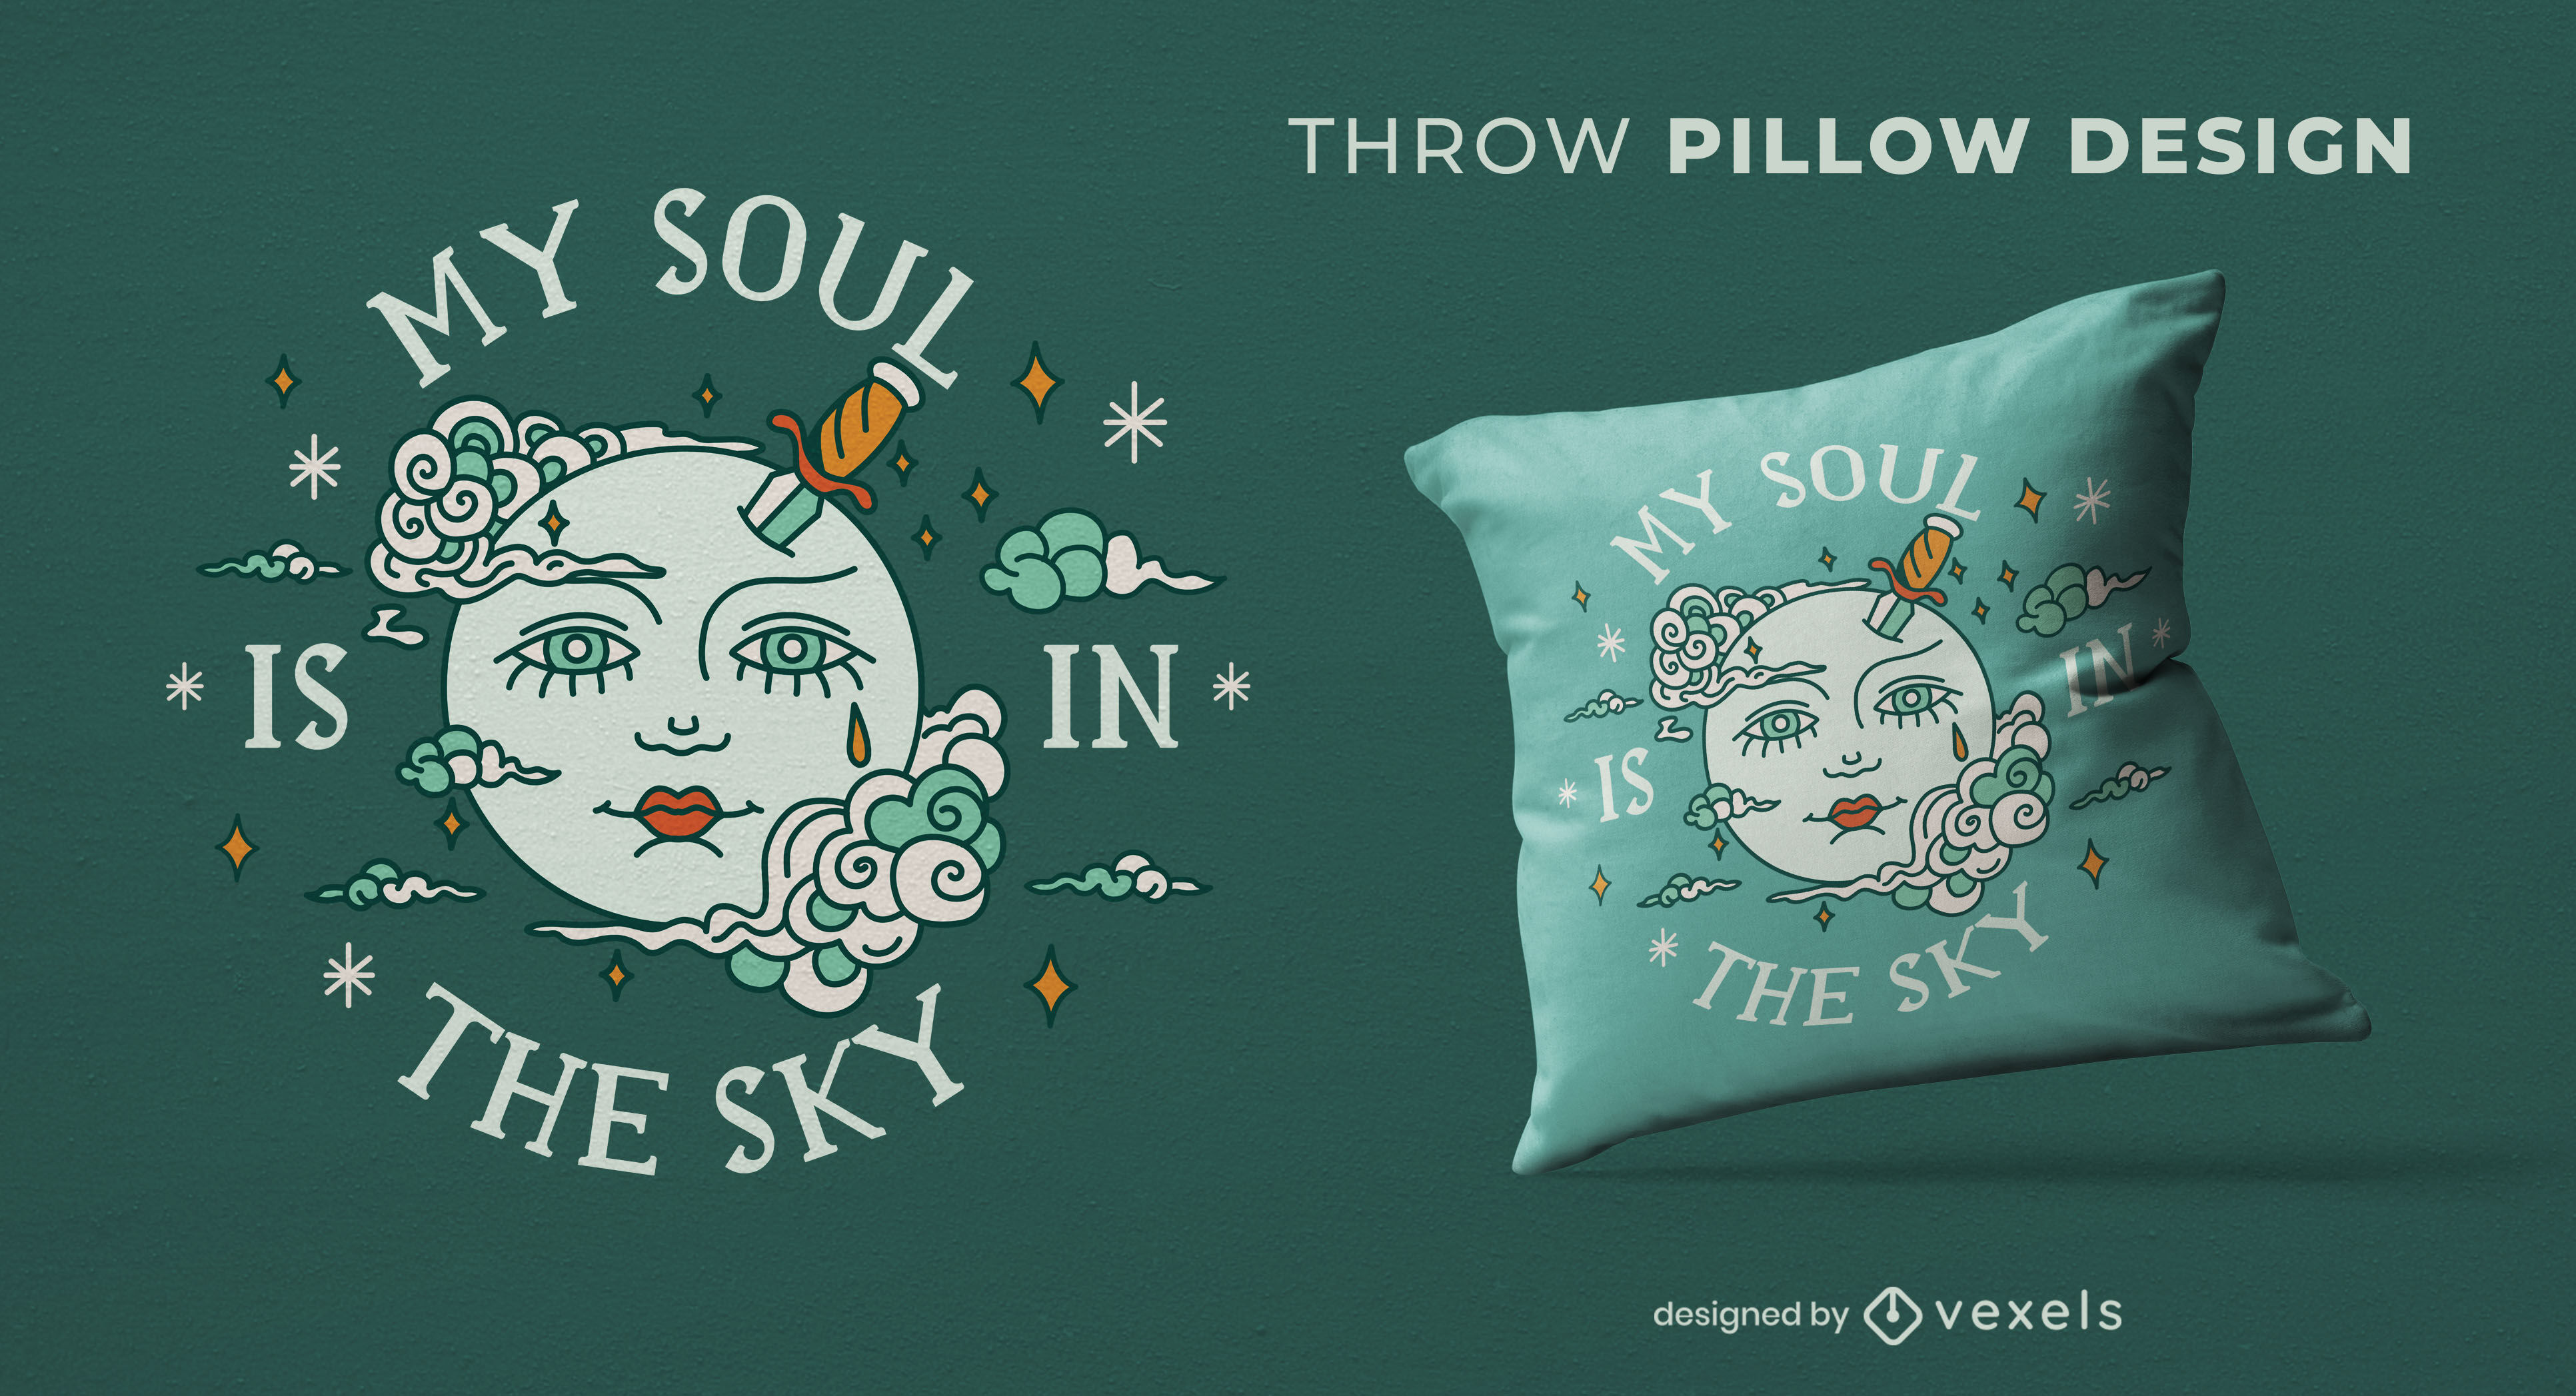 Face in the moon throw pillow design